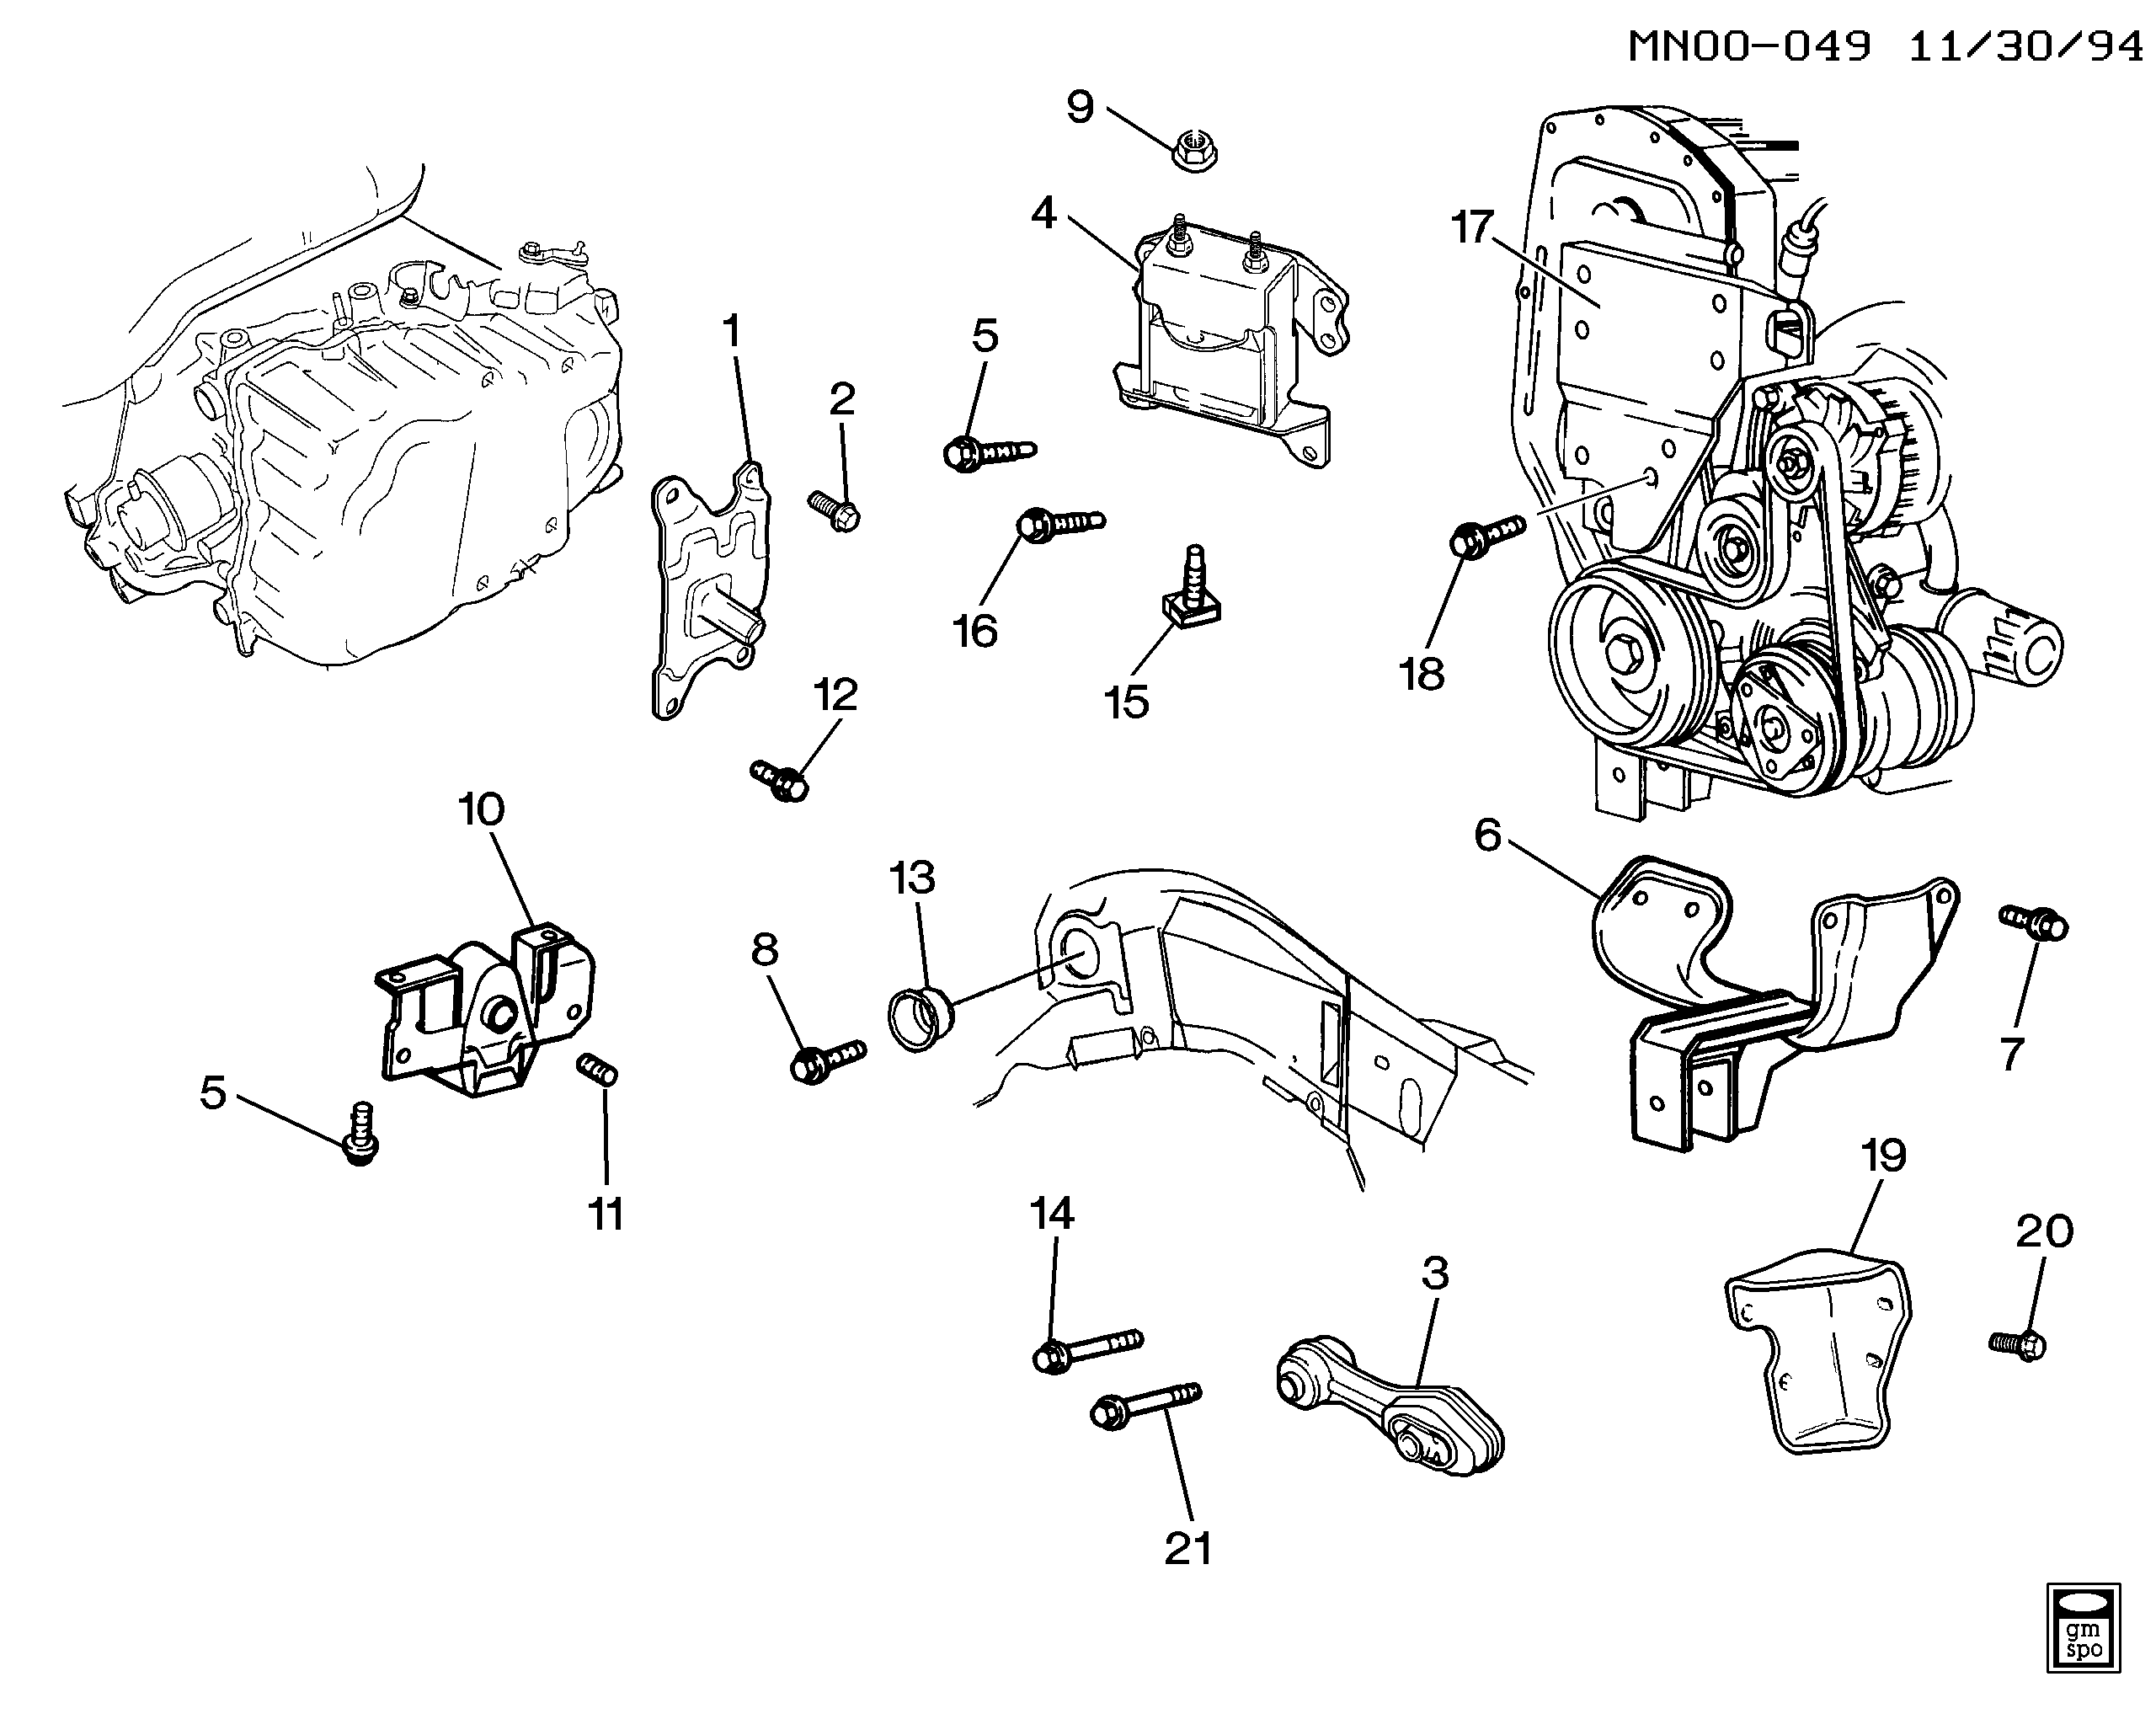 94 grand am engine diagram pontiac grand am n engine   transmission mounting l4 2 3l  l40  transmission mounting l4 2 3l